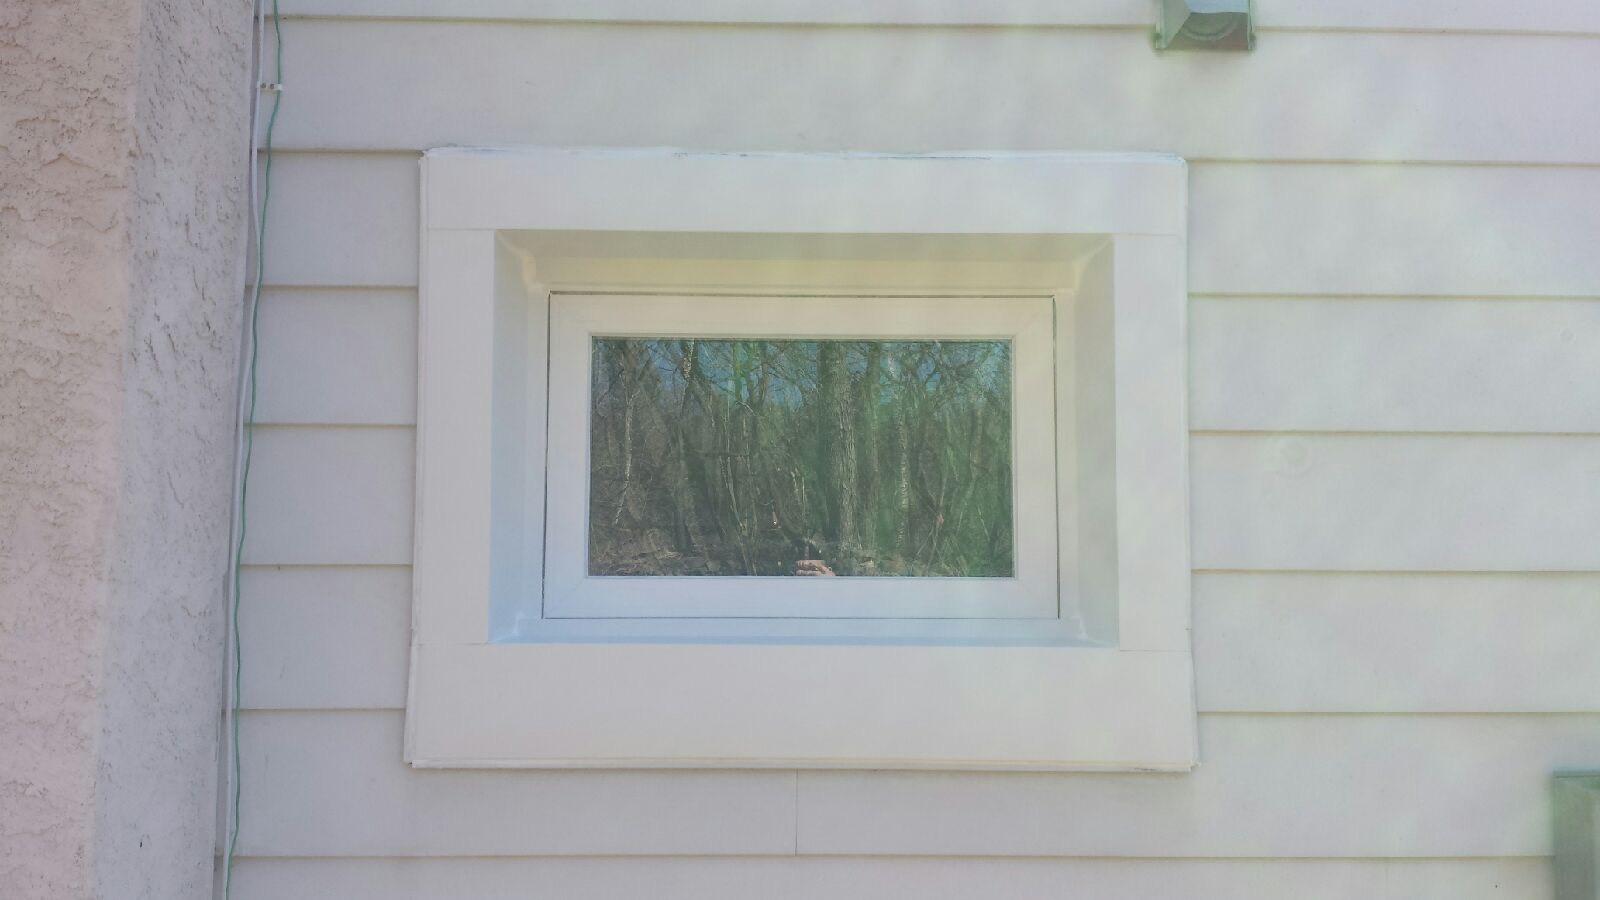 Fleet wood, PA Replacement Window